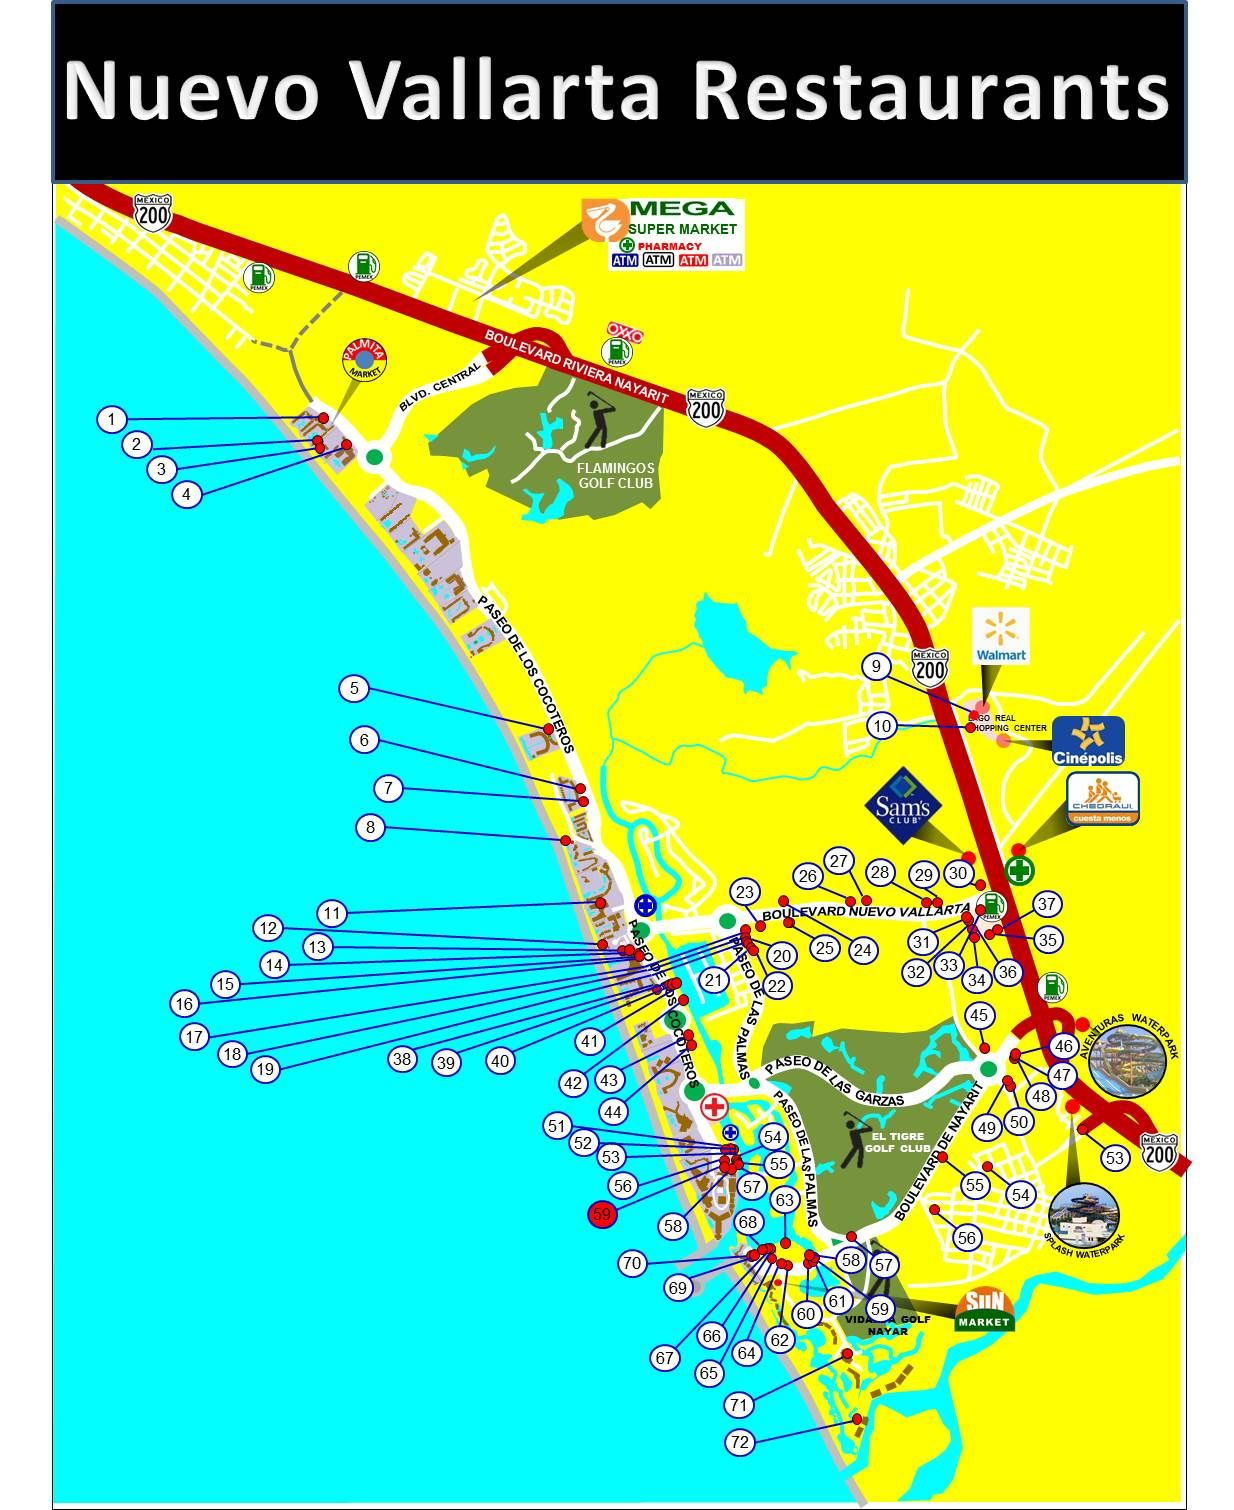 Map Of Nuevo Vallarta Mexico Restaurants. Location